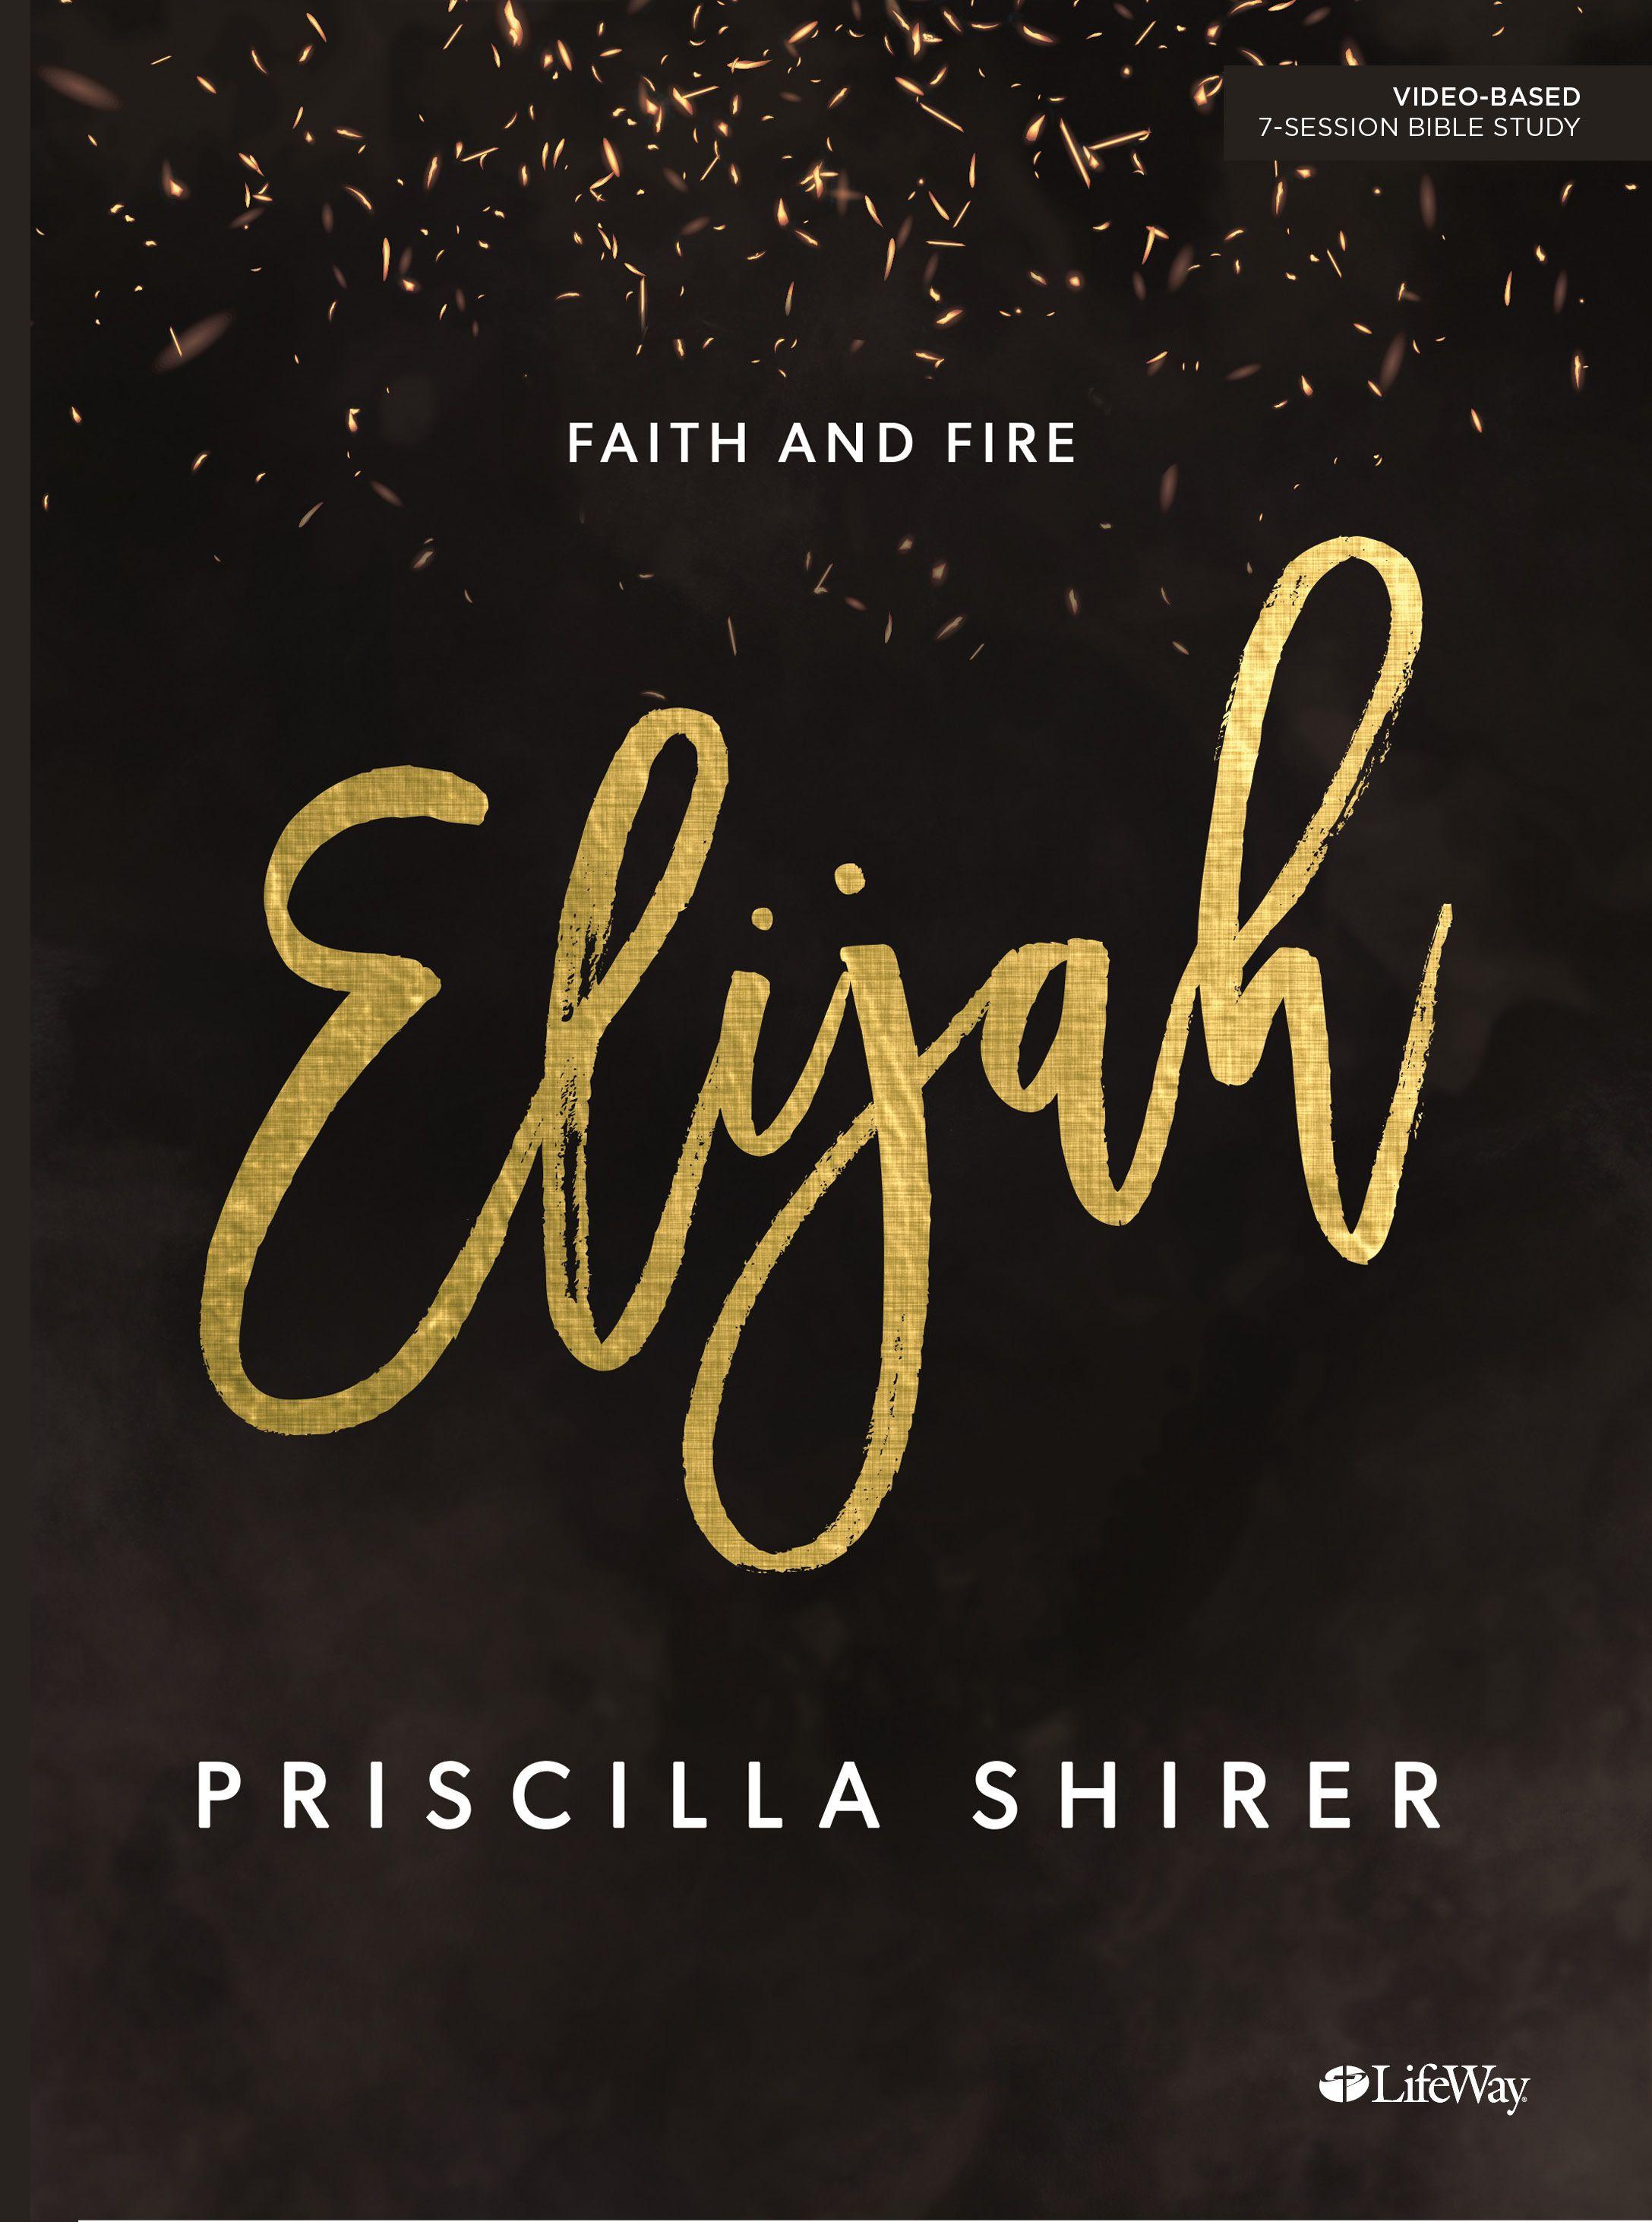 Elijah Priscilla Shirer